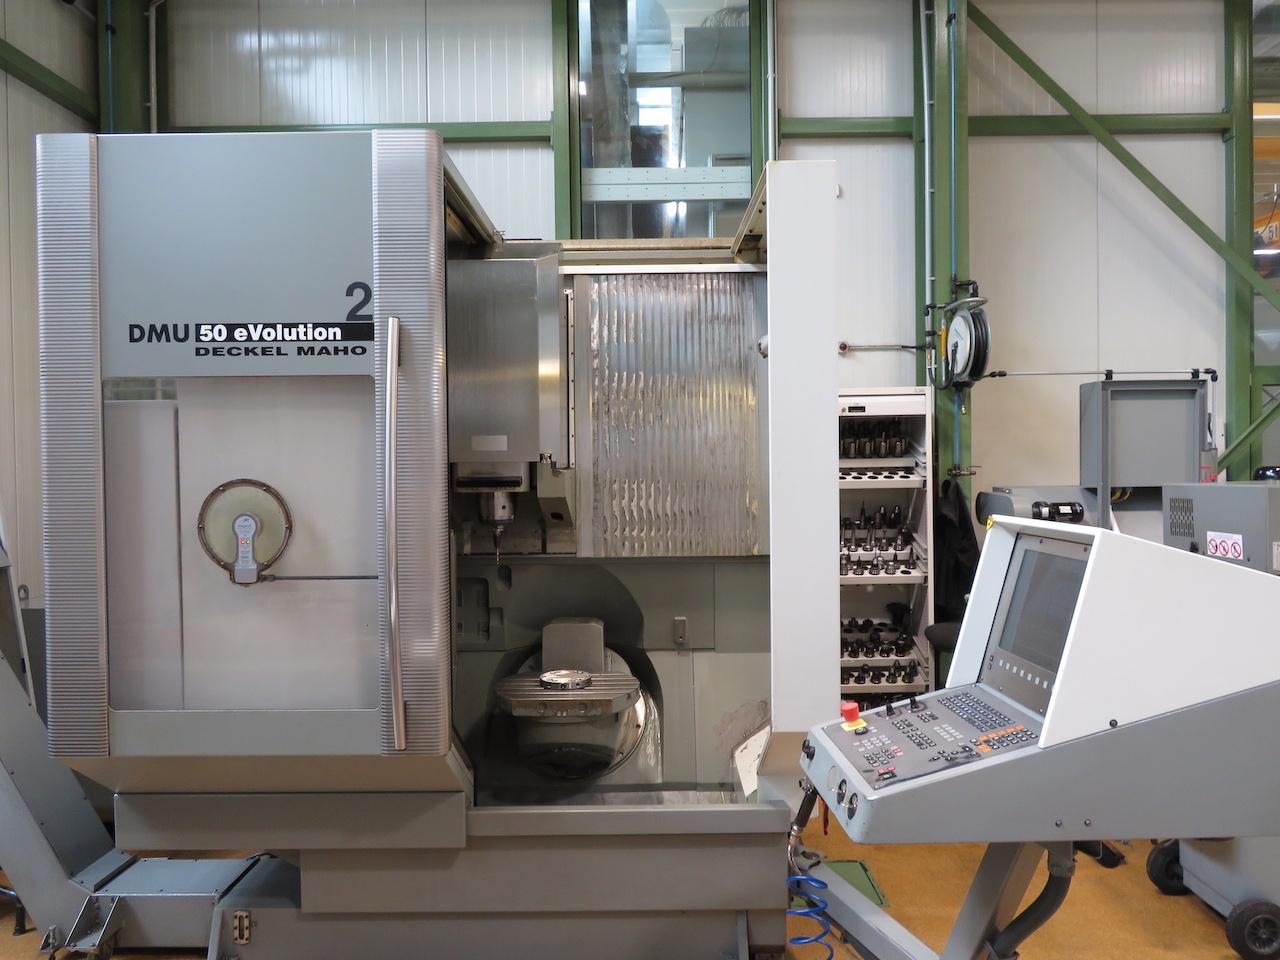 gebrauchte  Bearbeitungszentrum - Vertikal Deckel Maho DMU 50 eVolution